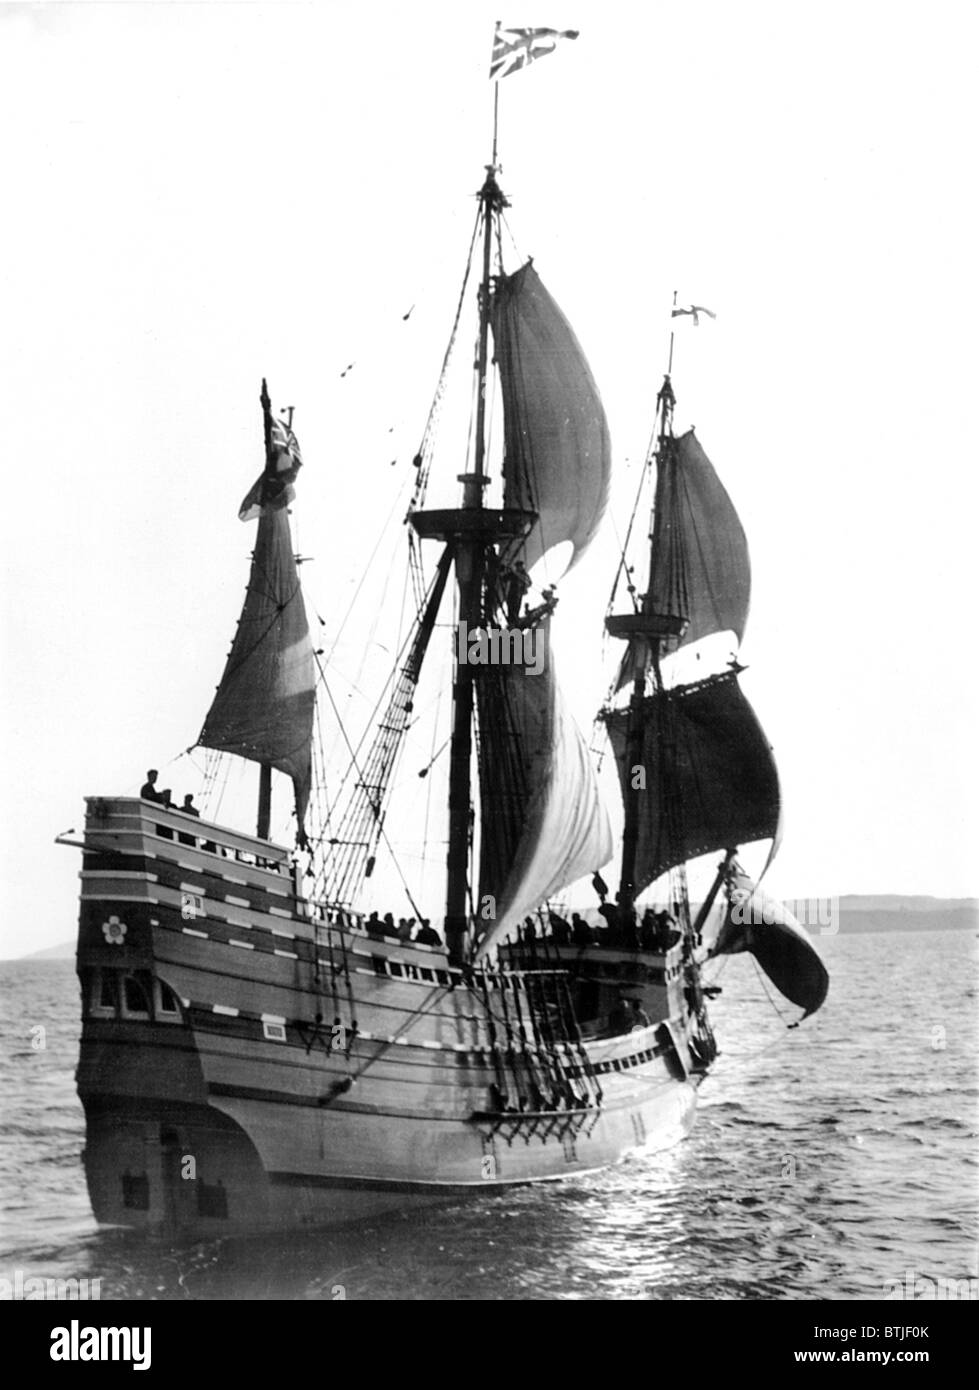 Mayflower II, Plymouth Harbor, Plymouth, England, 1957 Stockbild